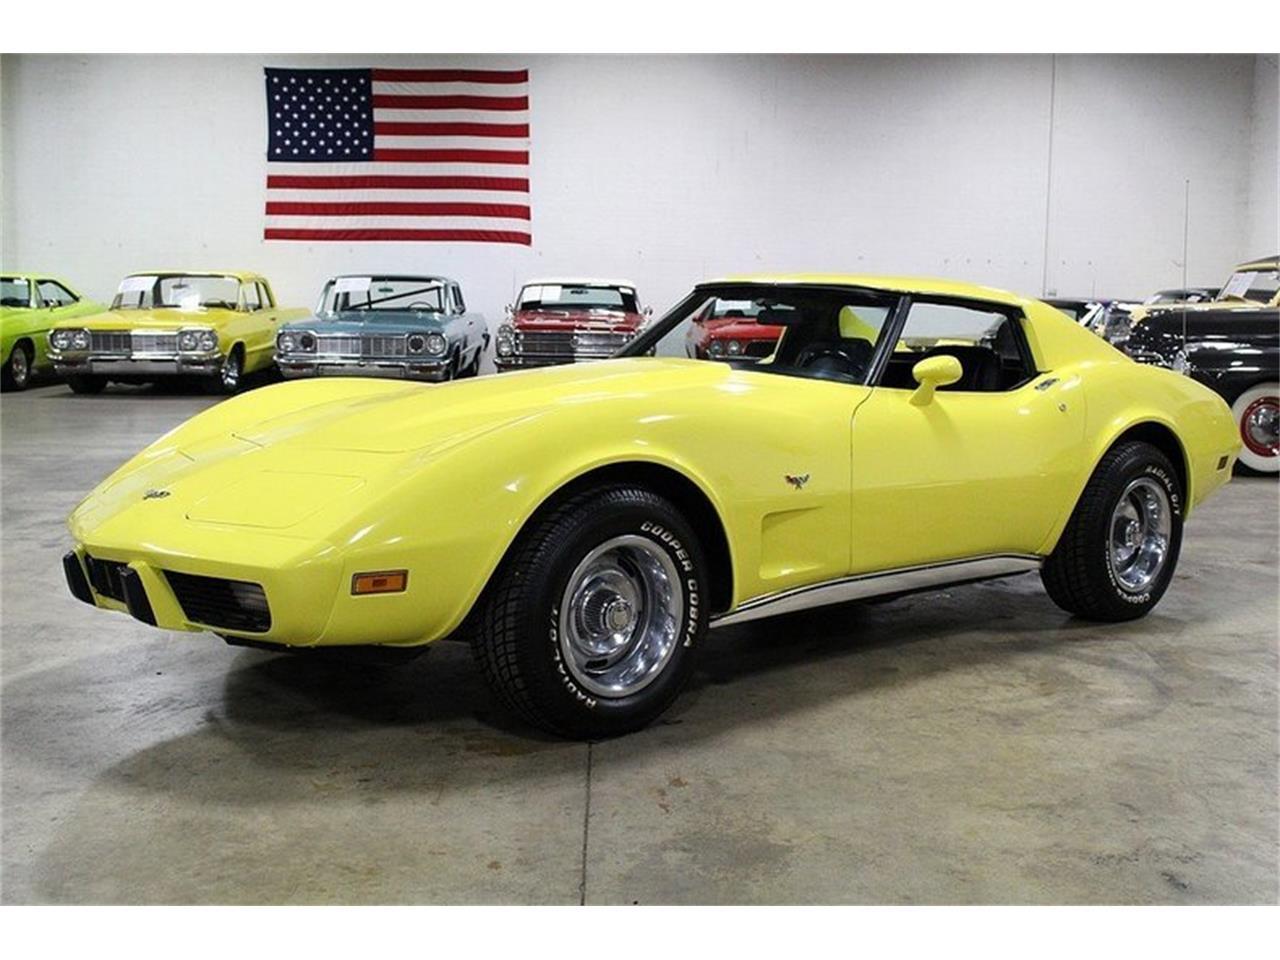 1977 Corvette For Sale >> For Sale 1977 Chevrolet Corvette In Kentwood Michigan